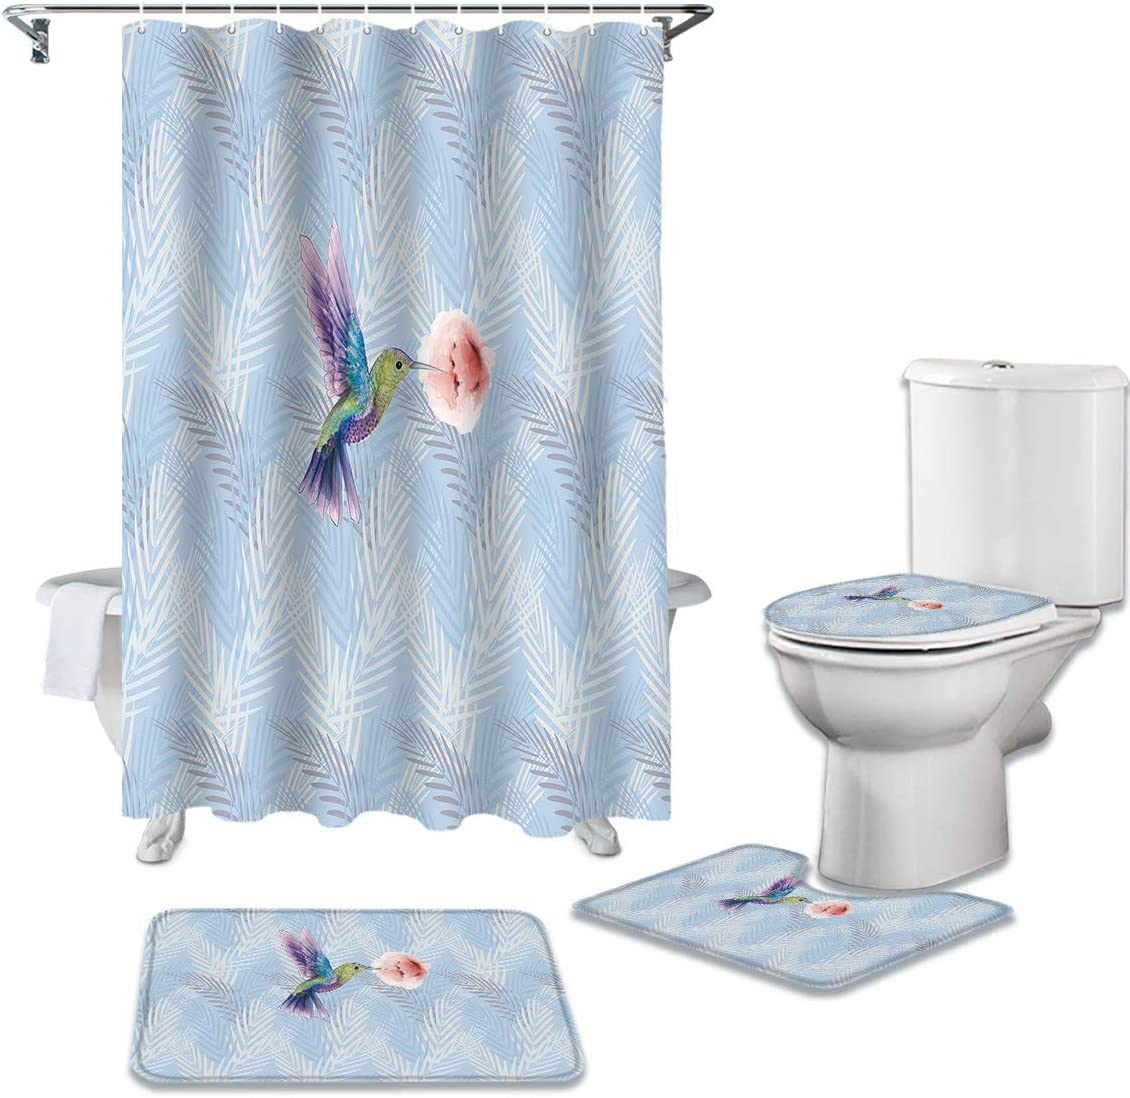 4 Piece shop Bathroom Gifts Set Cute Woodpecker Curtain Shower Colorful